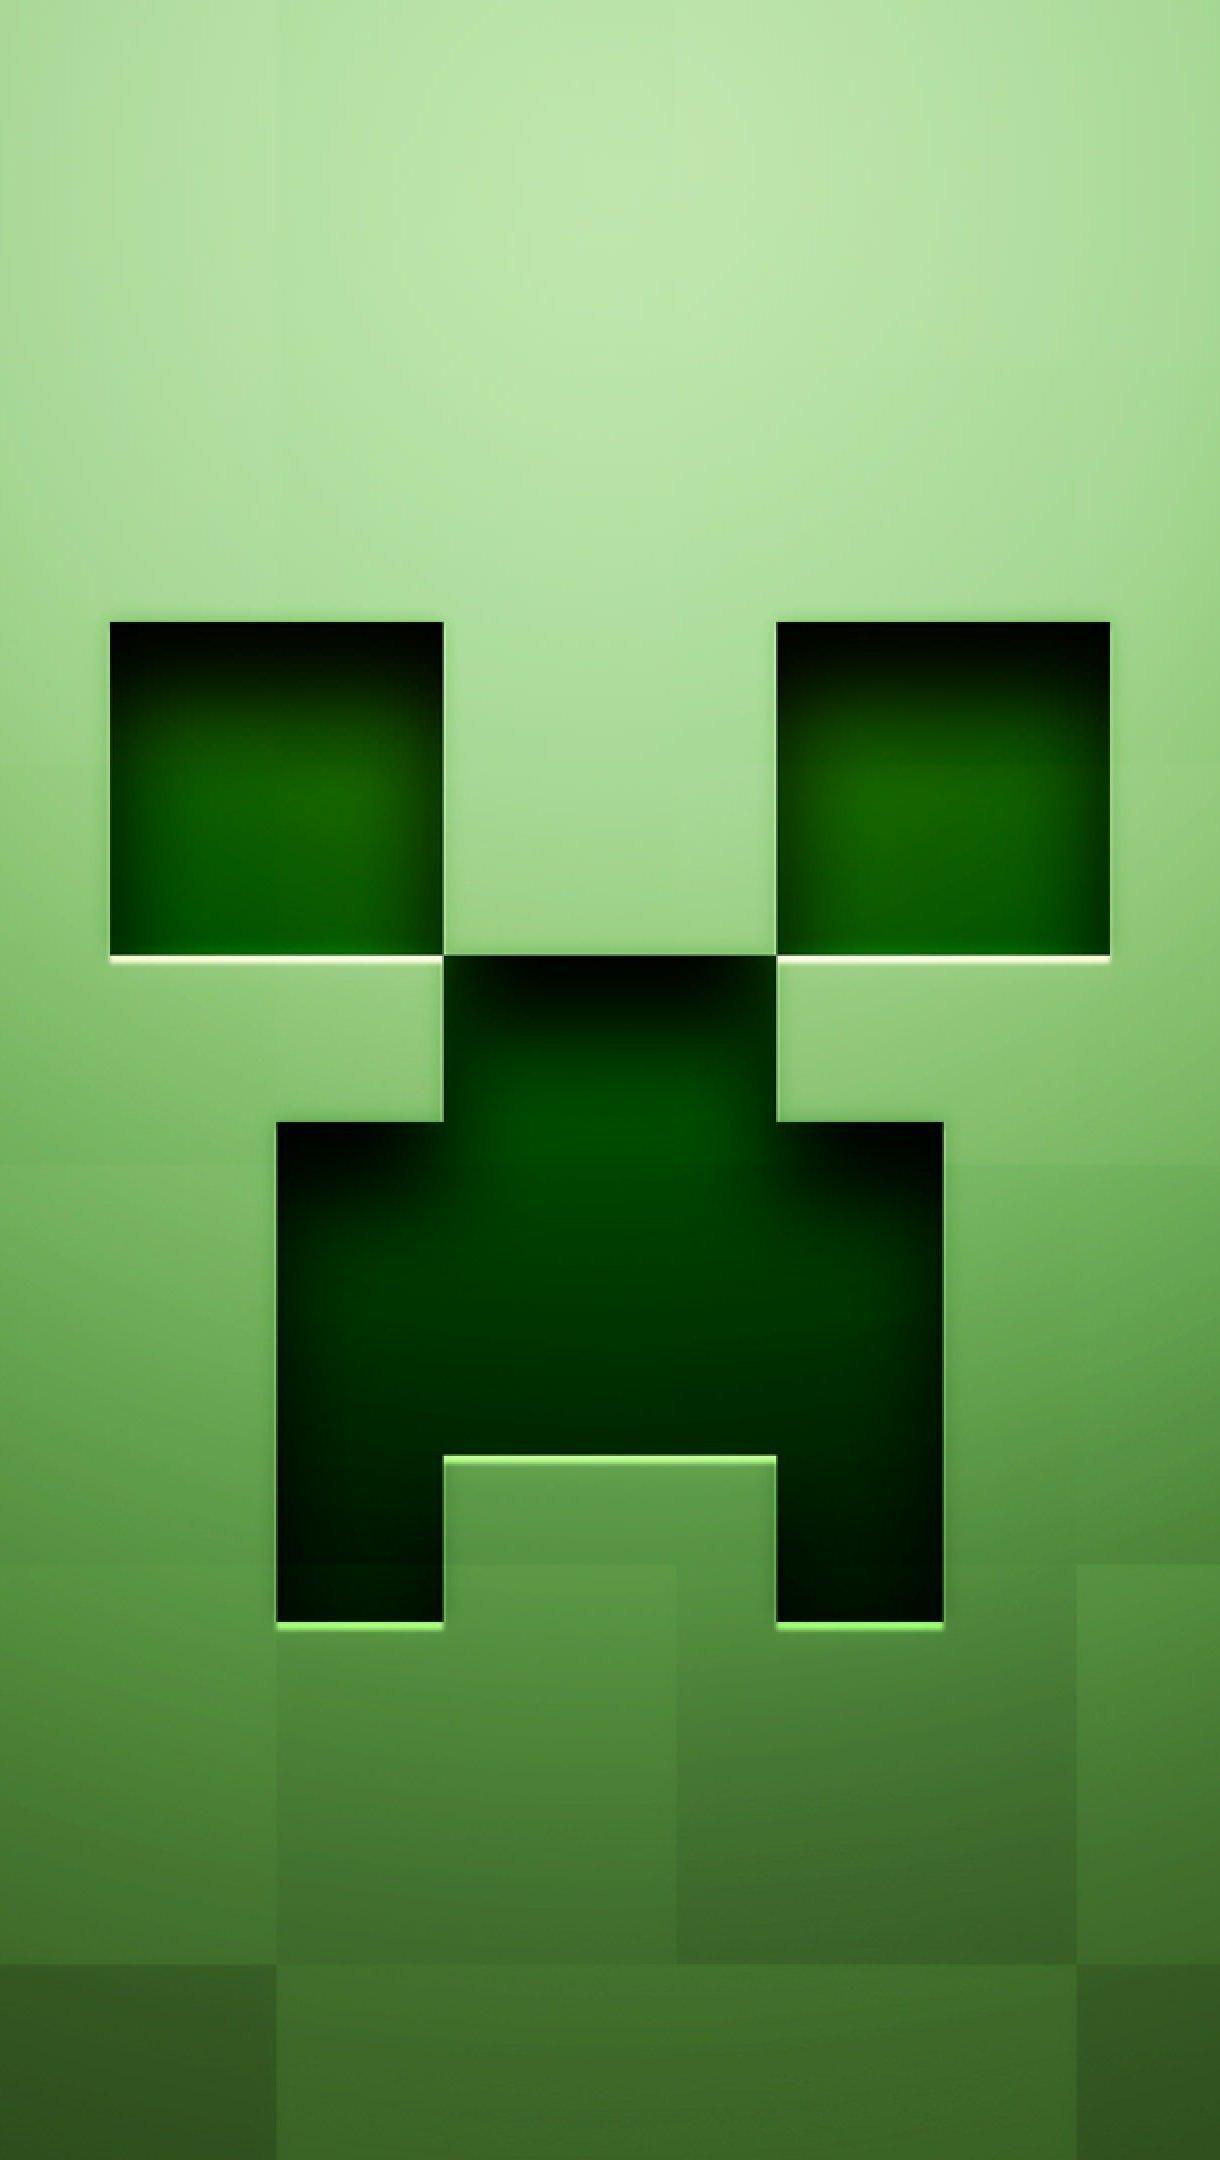 Wallpaper Creeper Minecraft Vertical